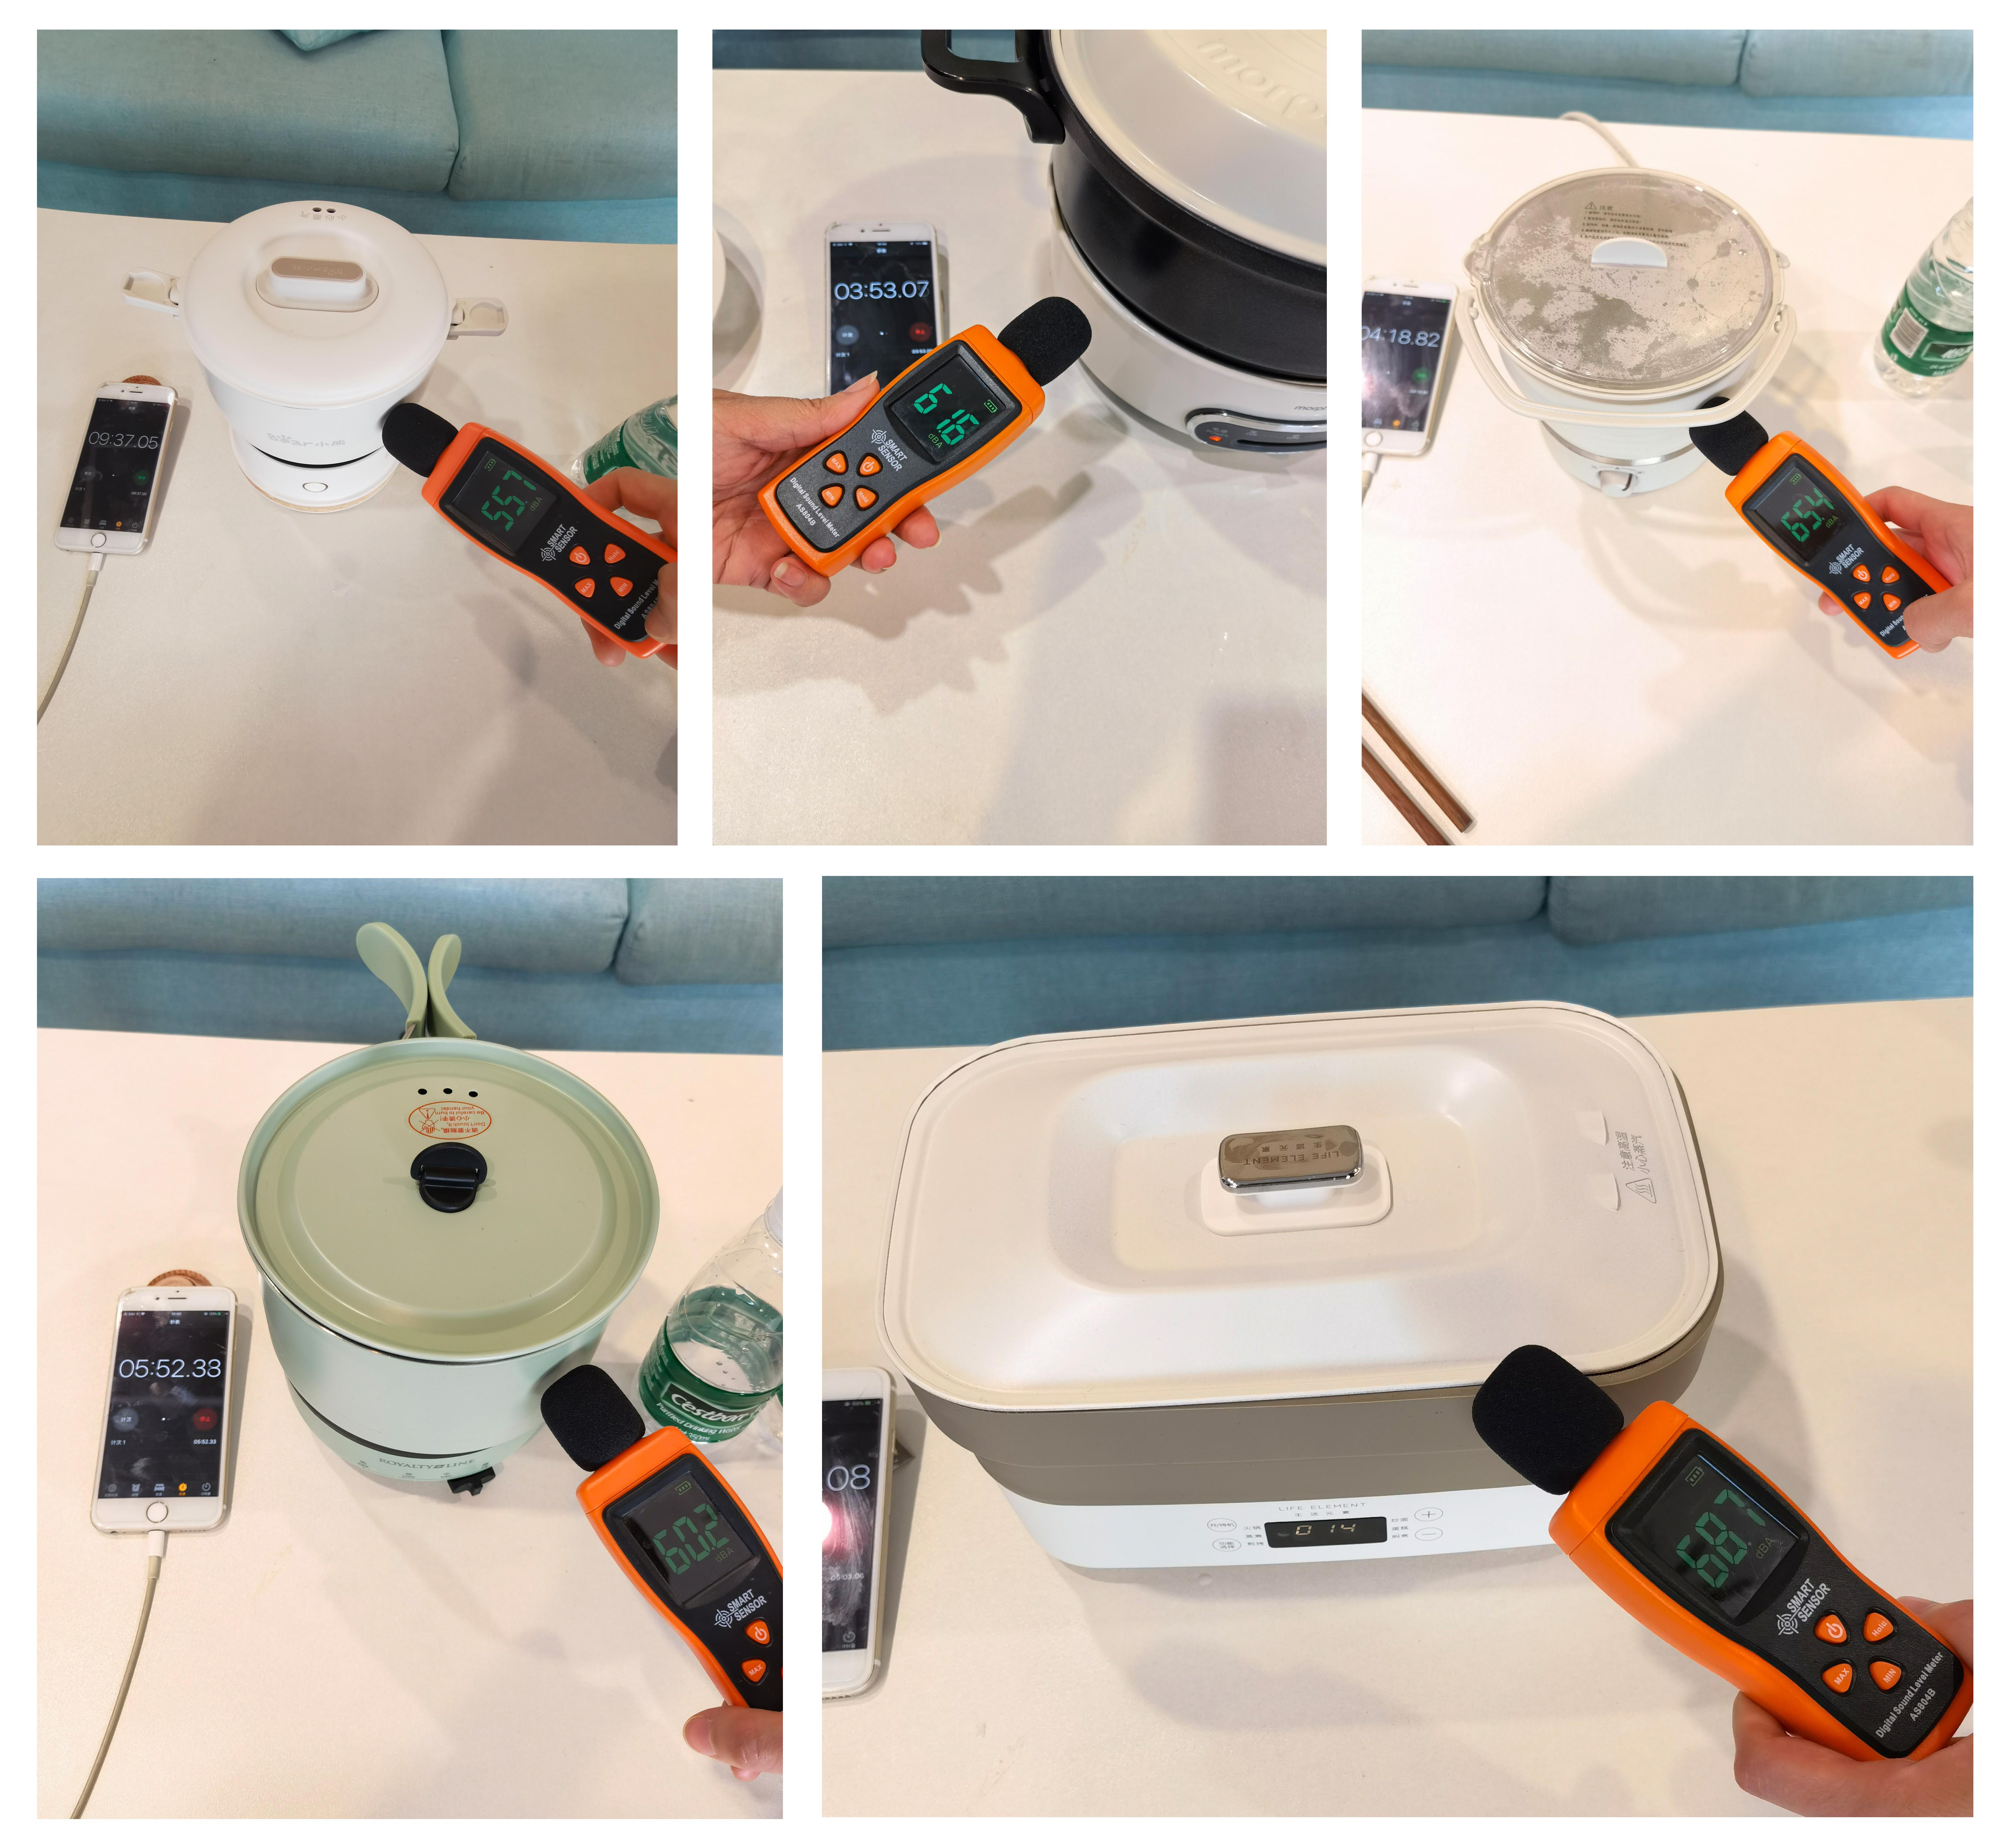 6�ƾ「便携折叠锅」深度测评:一个�h做饭从选一口锅开�? inline=